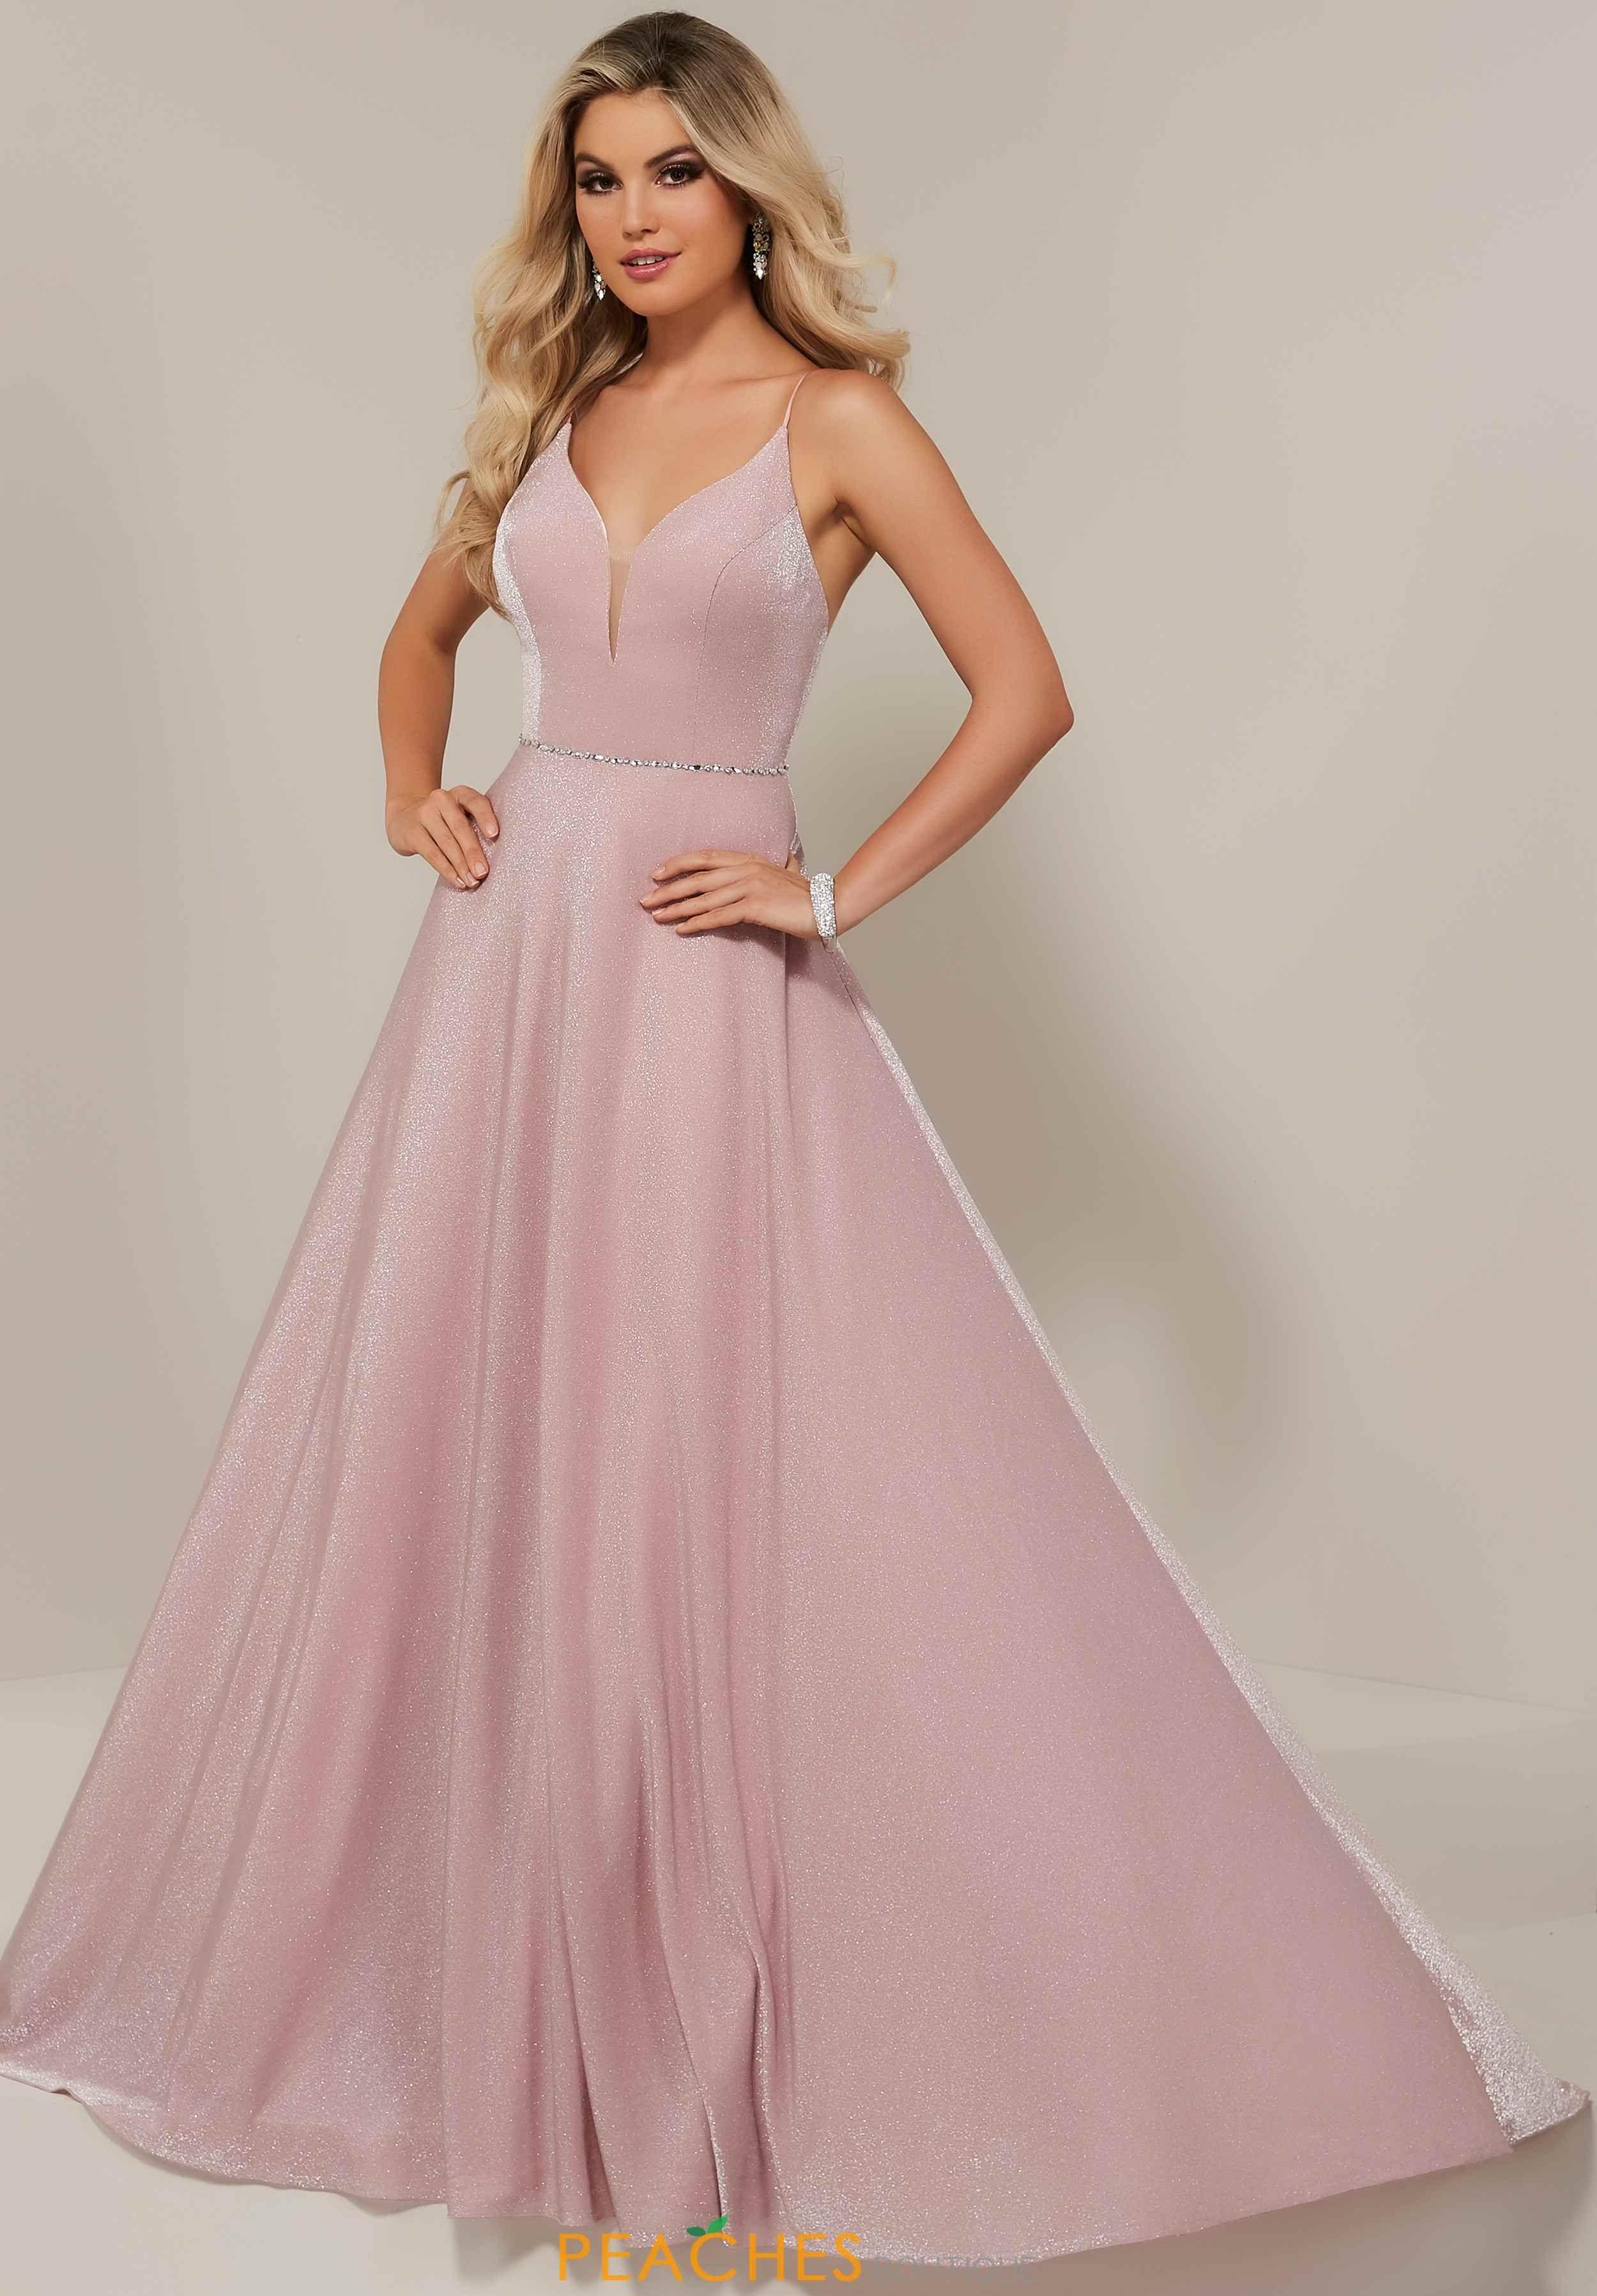 296cee2371b Tiffany Jersey A Line Dress 16345 in 2019